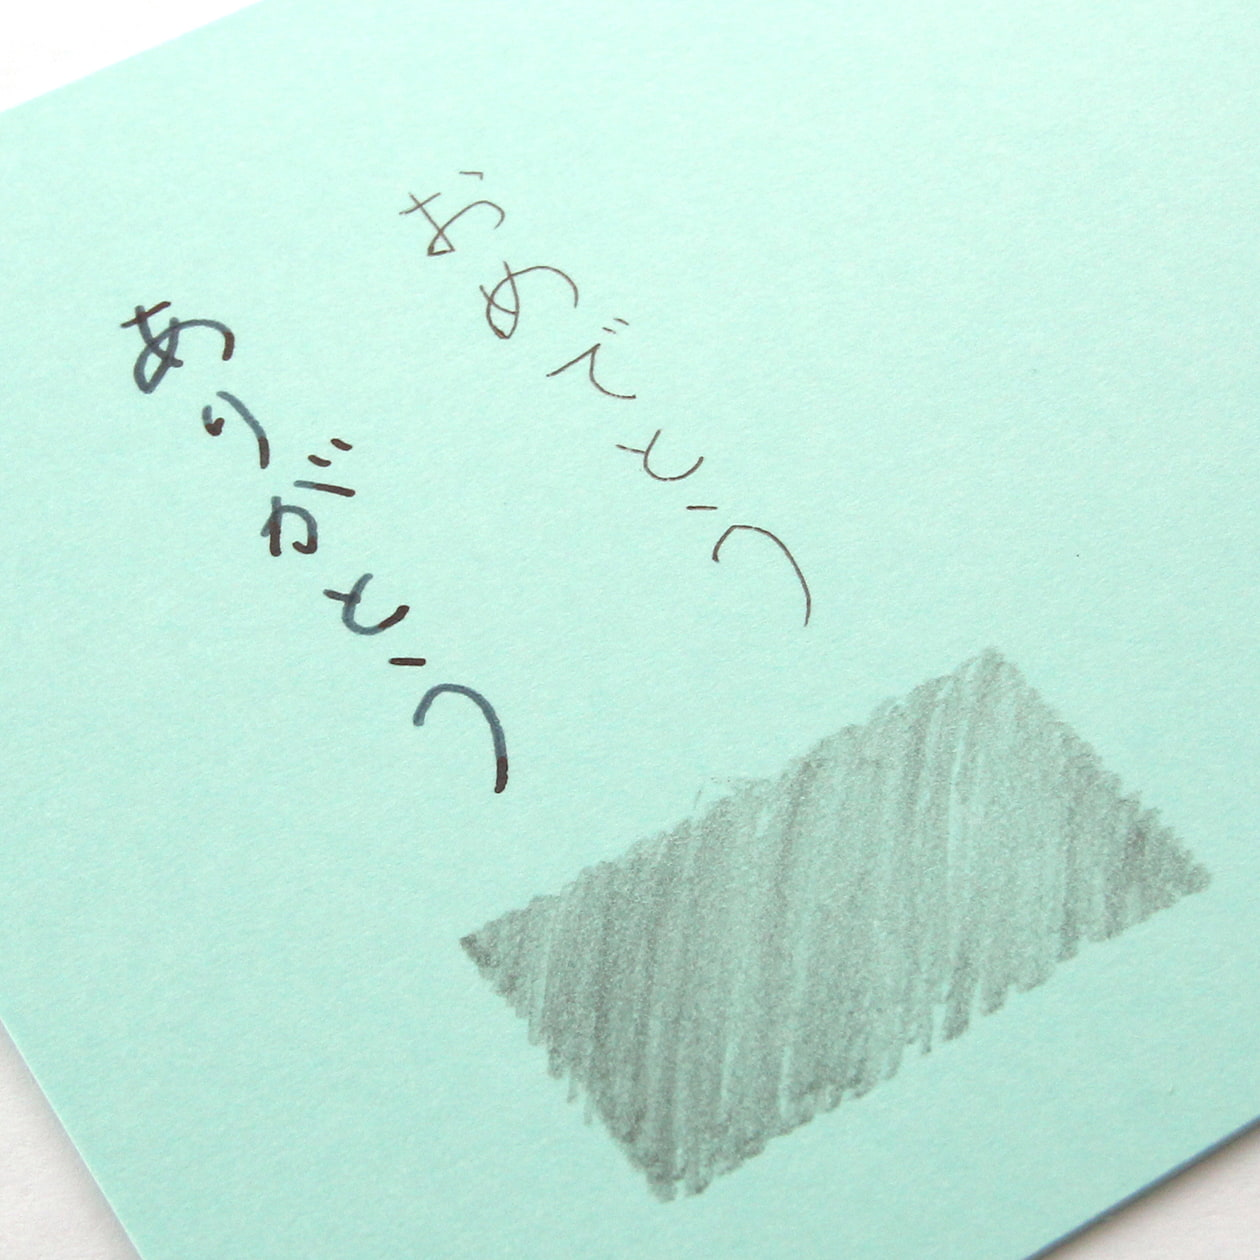 Pカード ボード紙 ペールブルー 465g